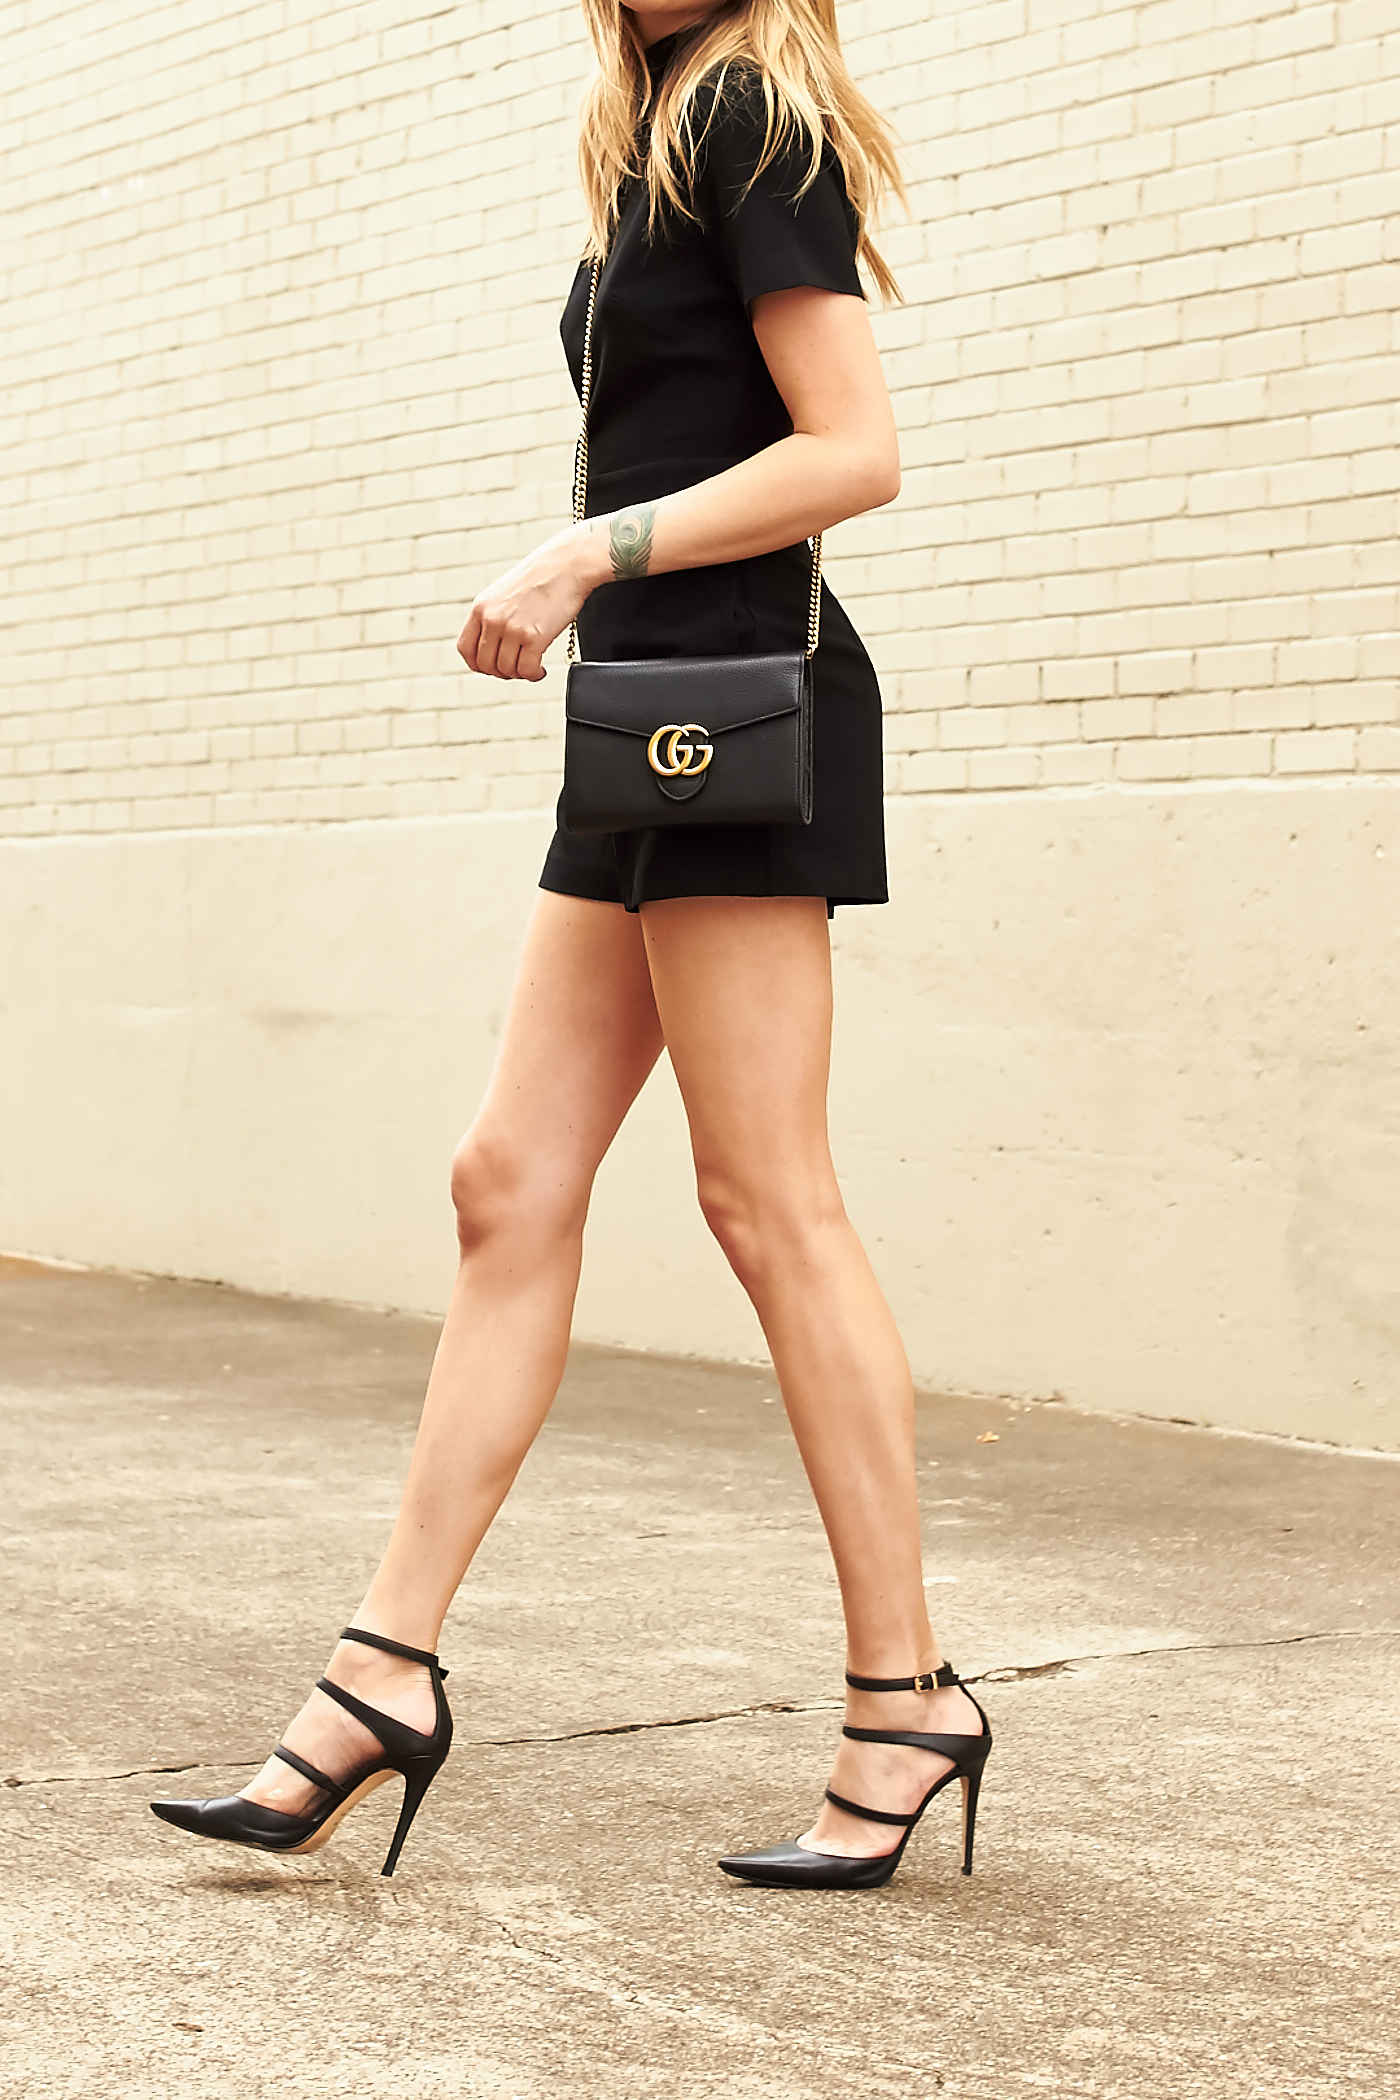 fashion-jackson-gucci-black-marmont-handbag-black-romper-black-strappy-heels